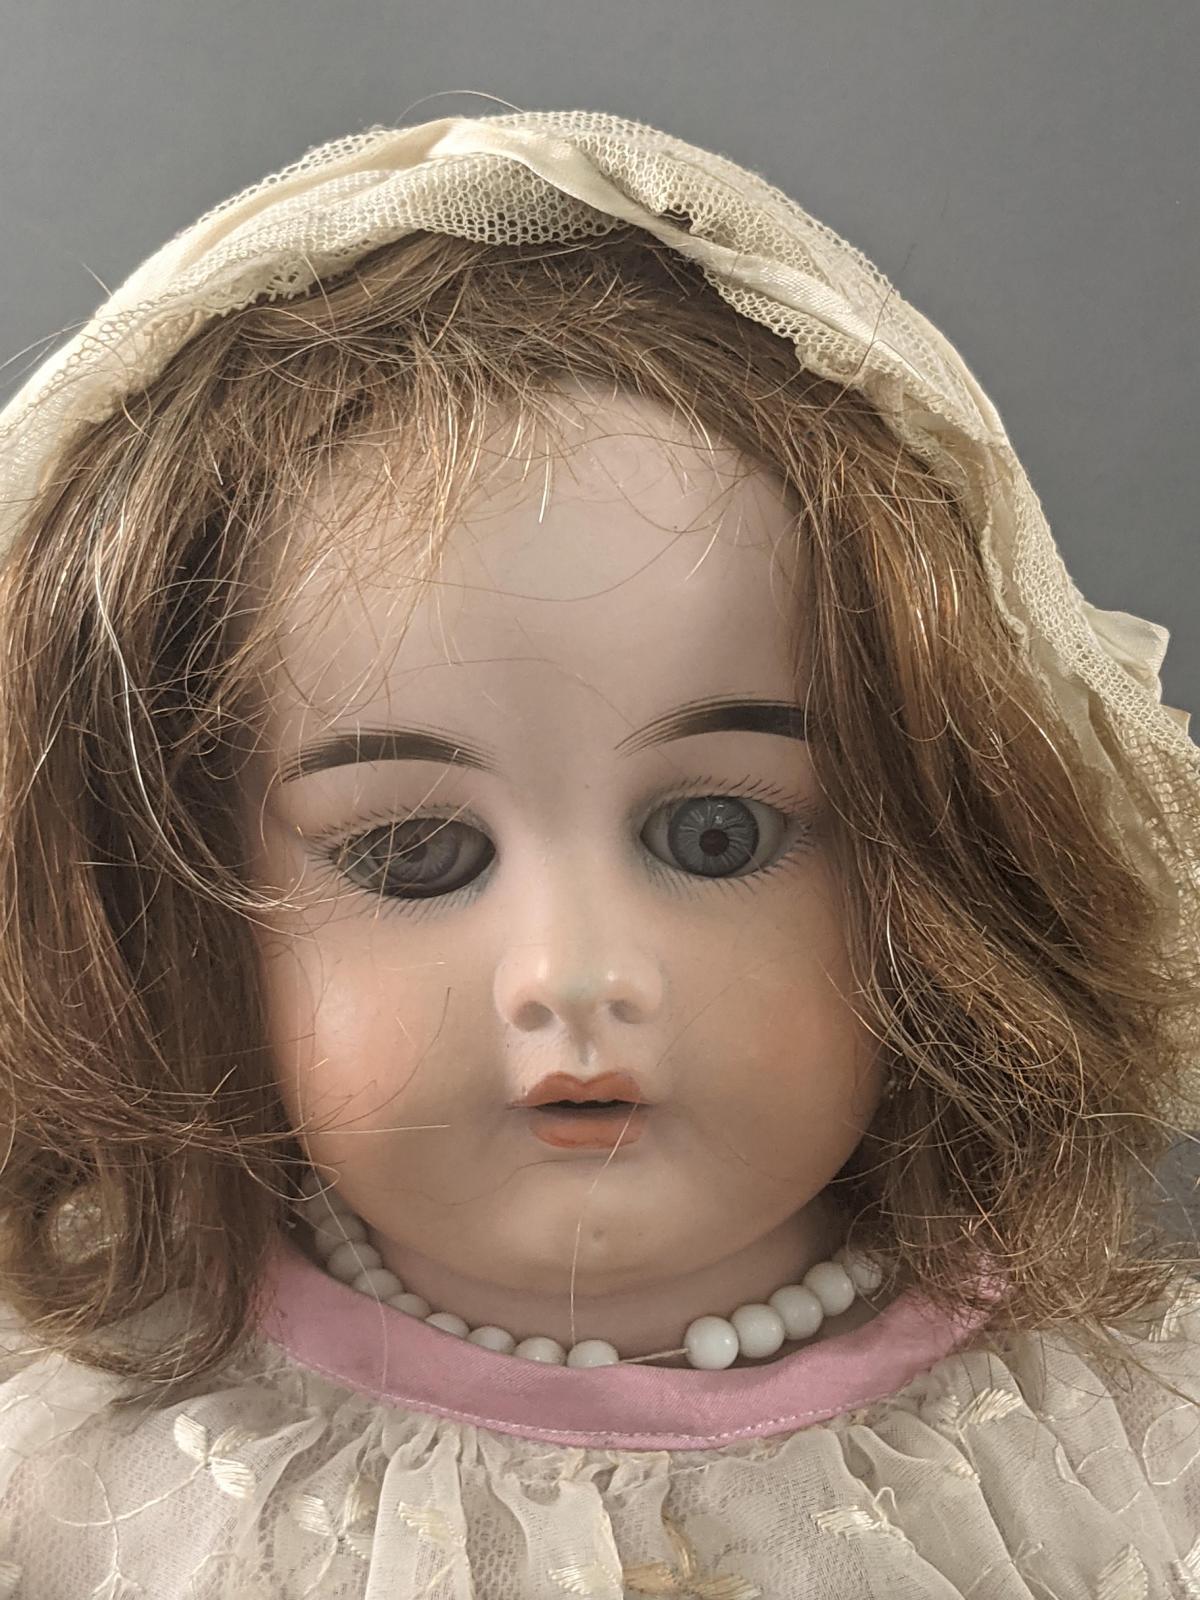 Porzellan-Schulterkopf-Puppe, gemarkt P. H. 5 1904-2